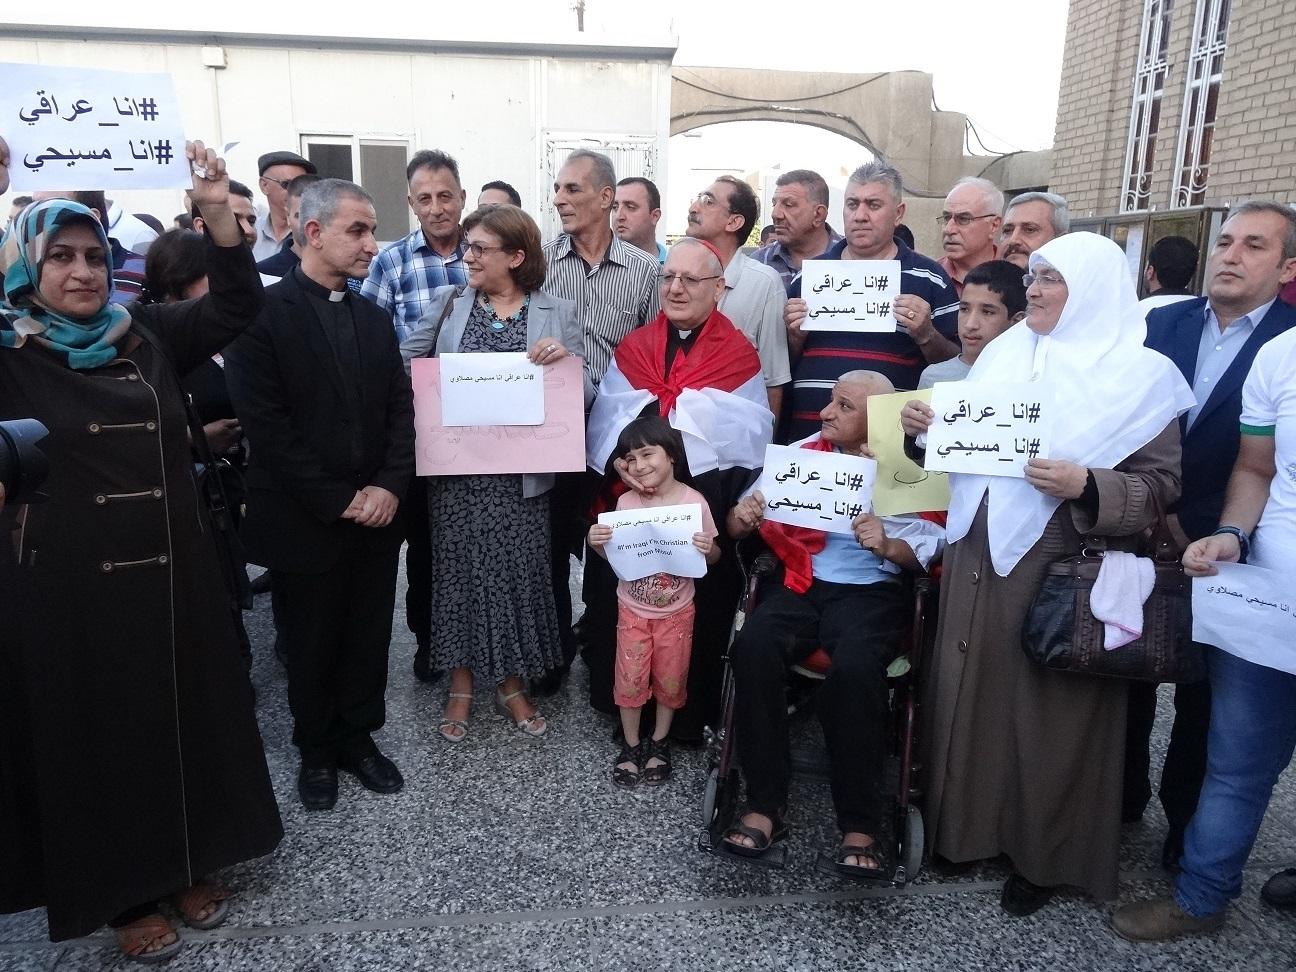 musulmani-cristiani-iraq-baghdad